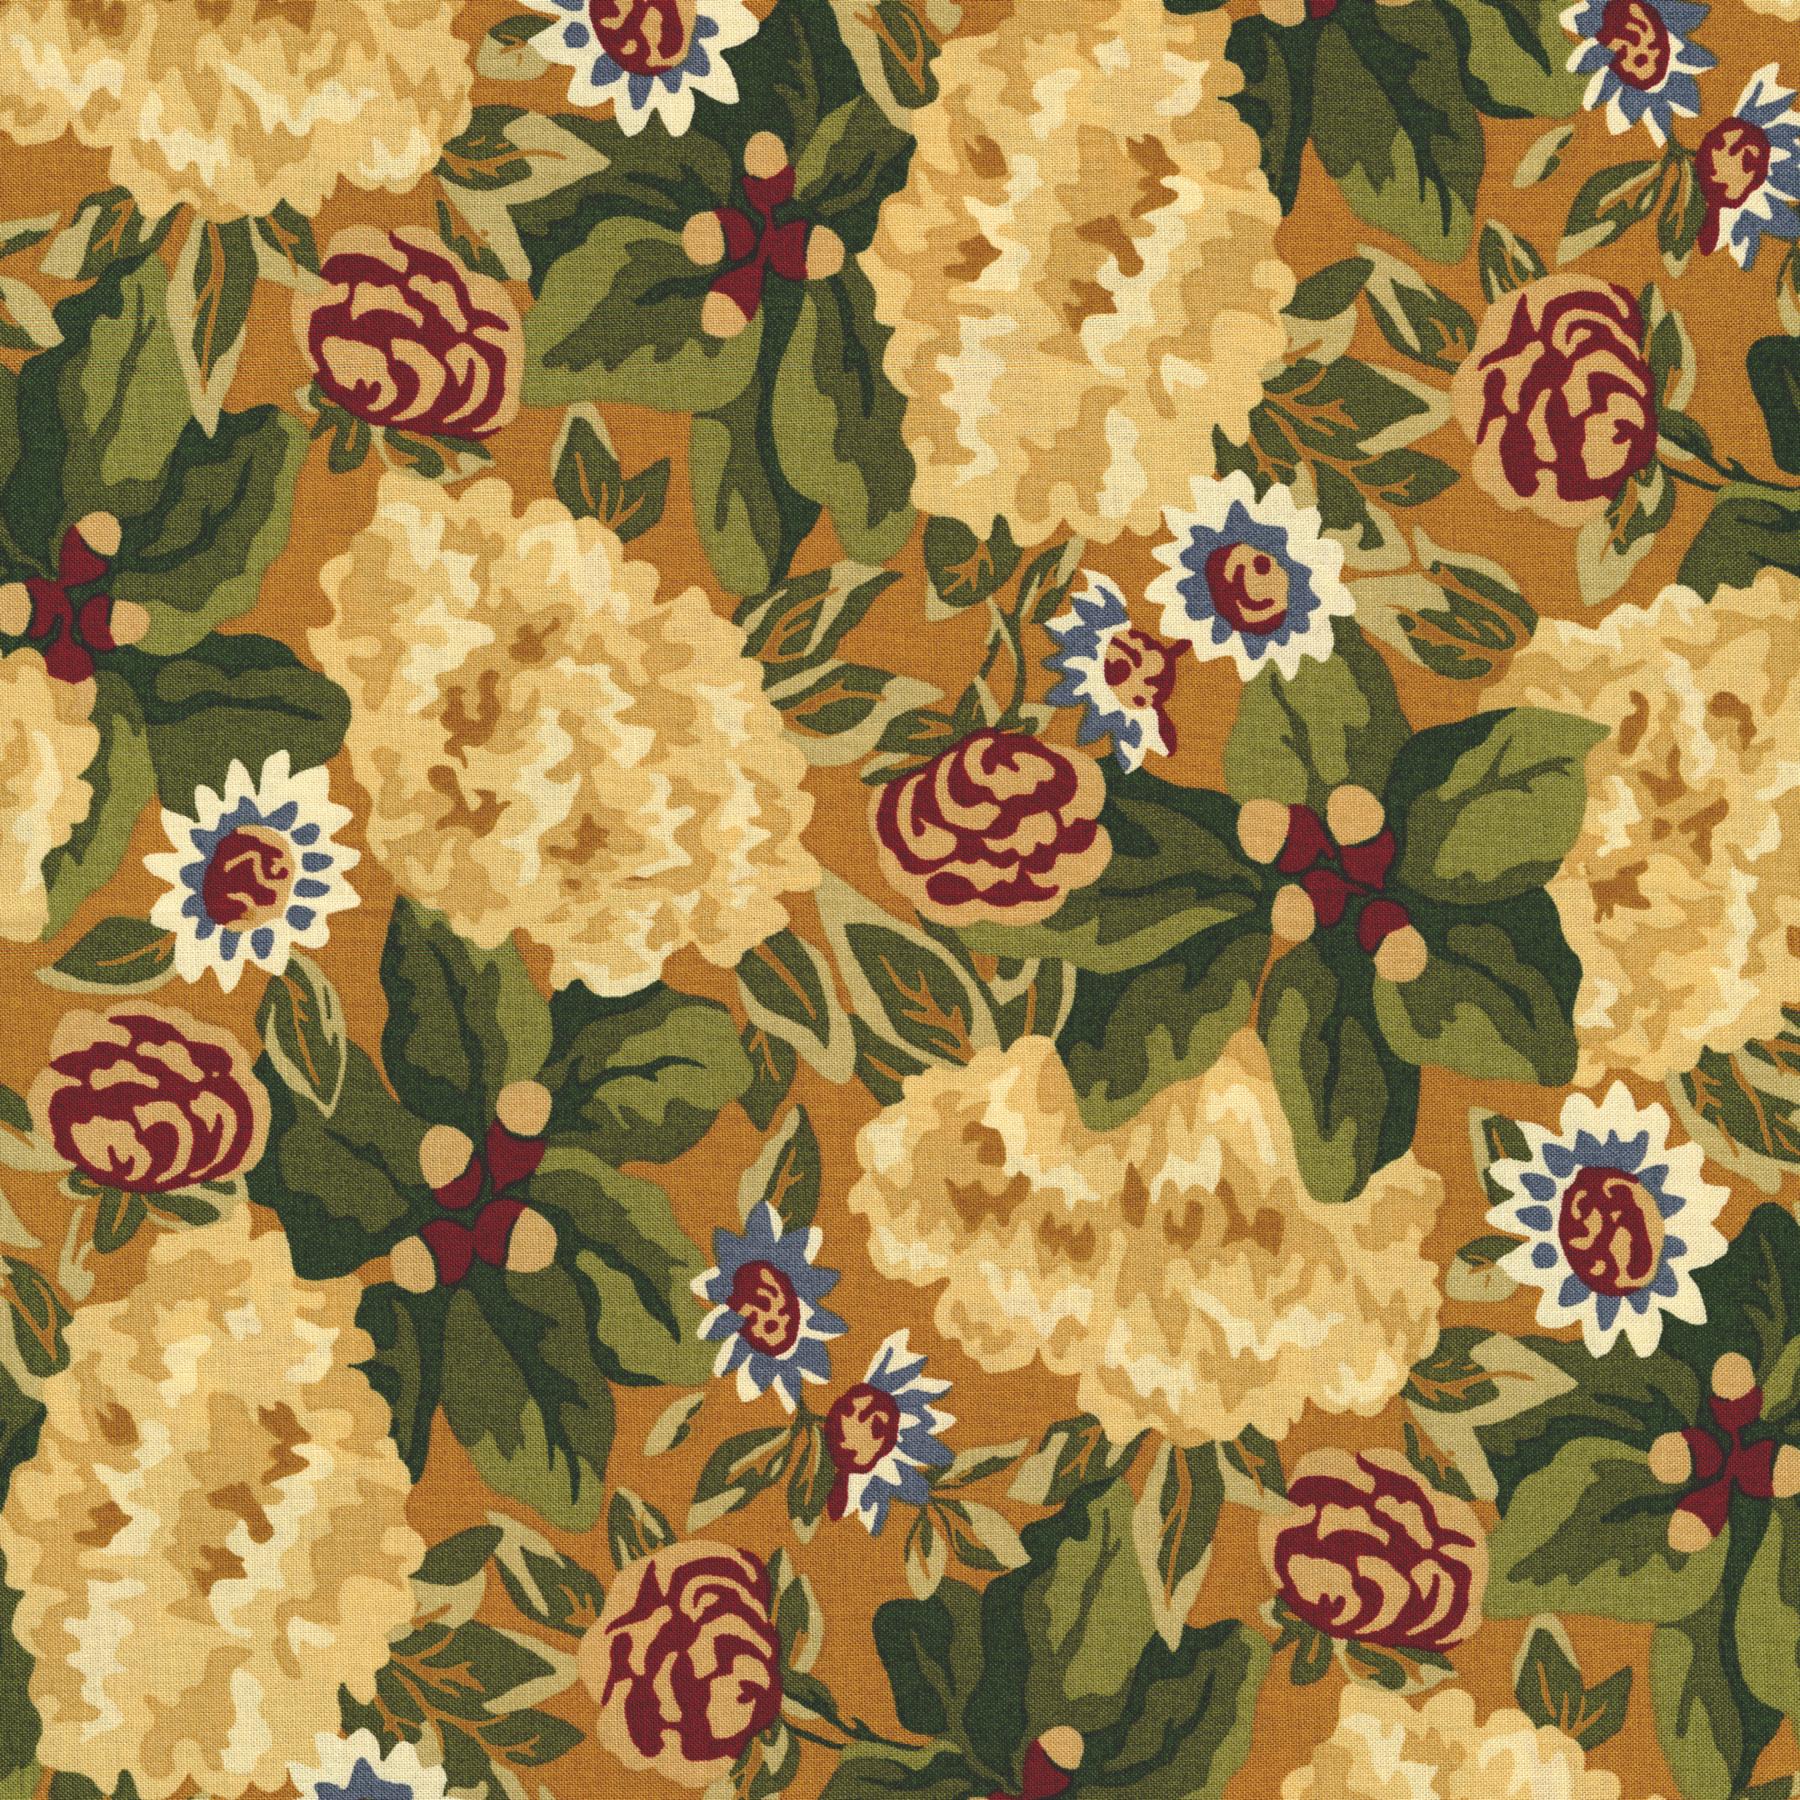 2753-002 Autumn Landscape - Harvest Garden - Gold Fabric   RJR Fabrics